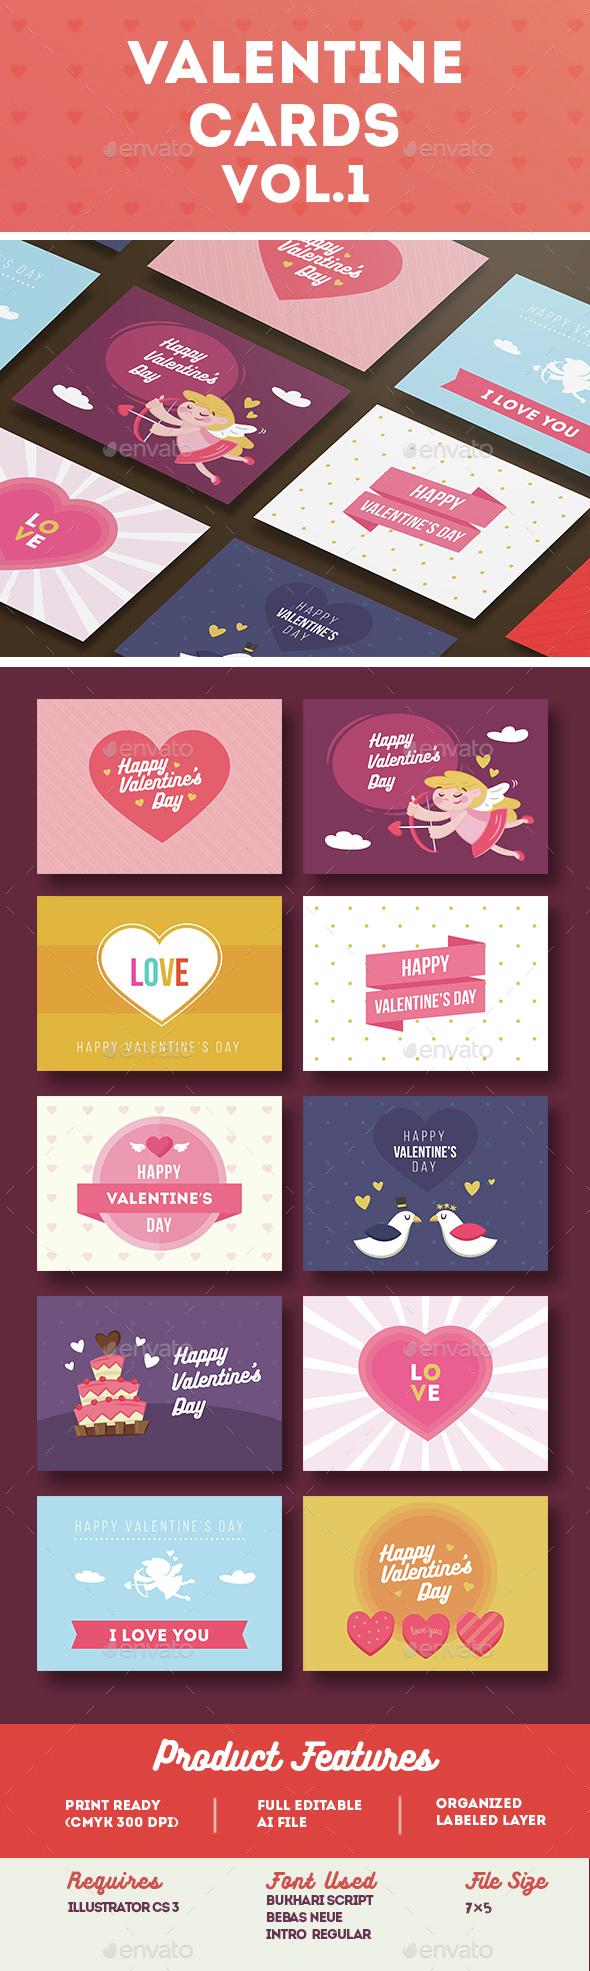 Valentine Card Vol.1 - Cards & Invites Print Templates